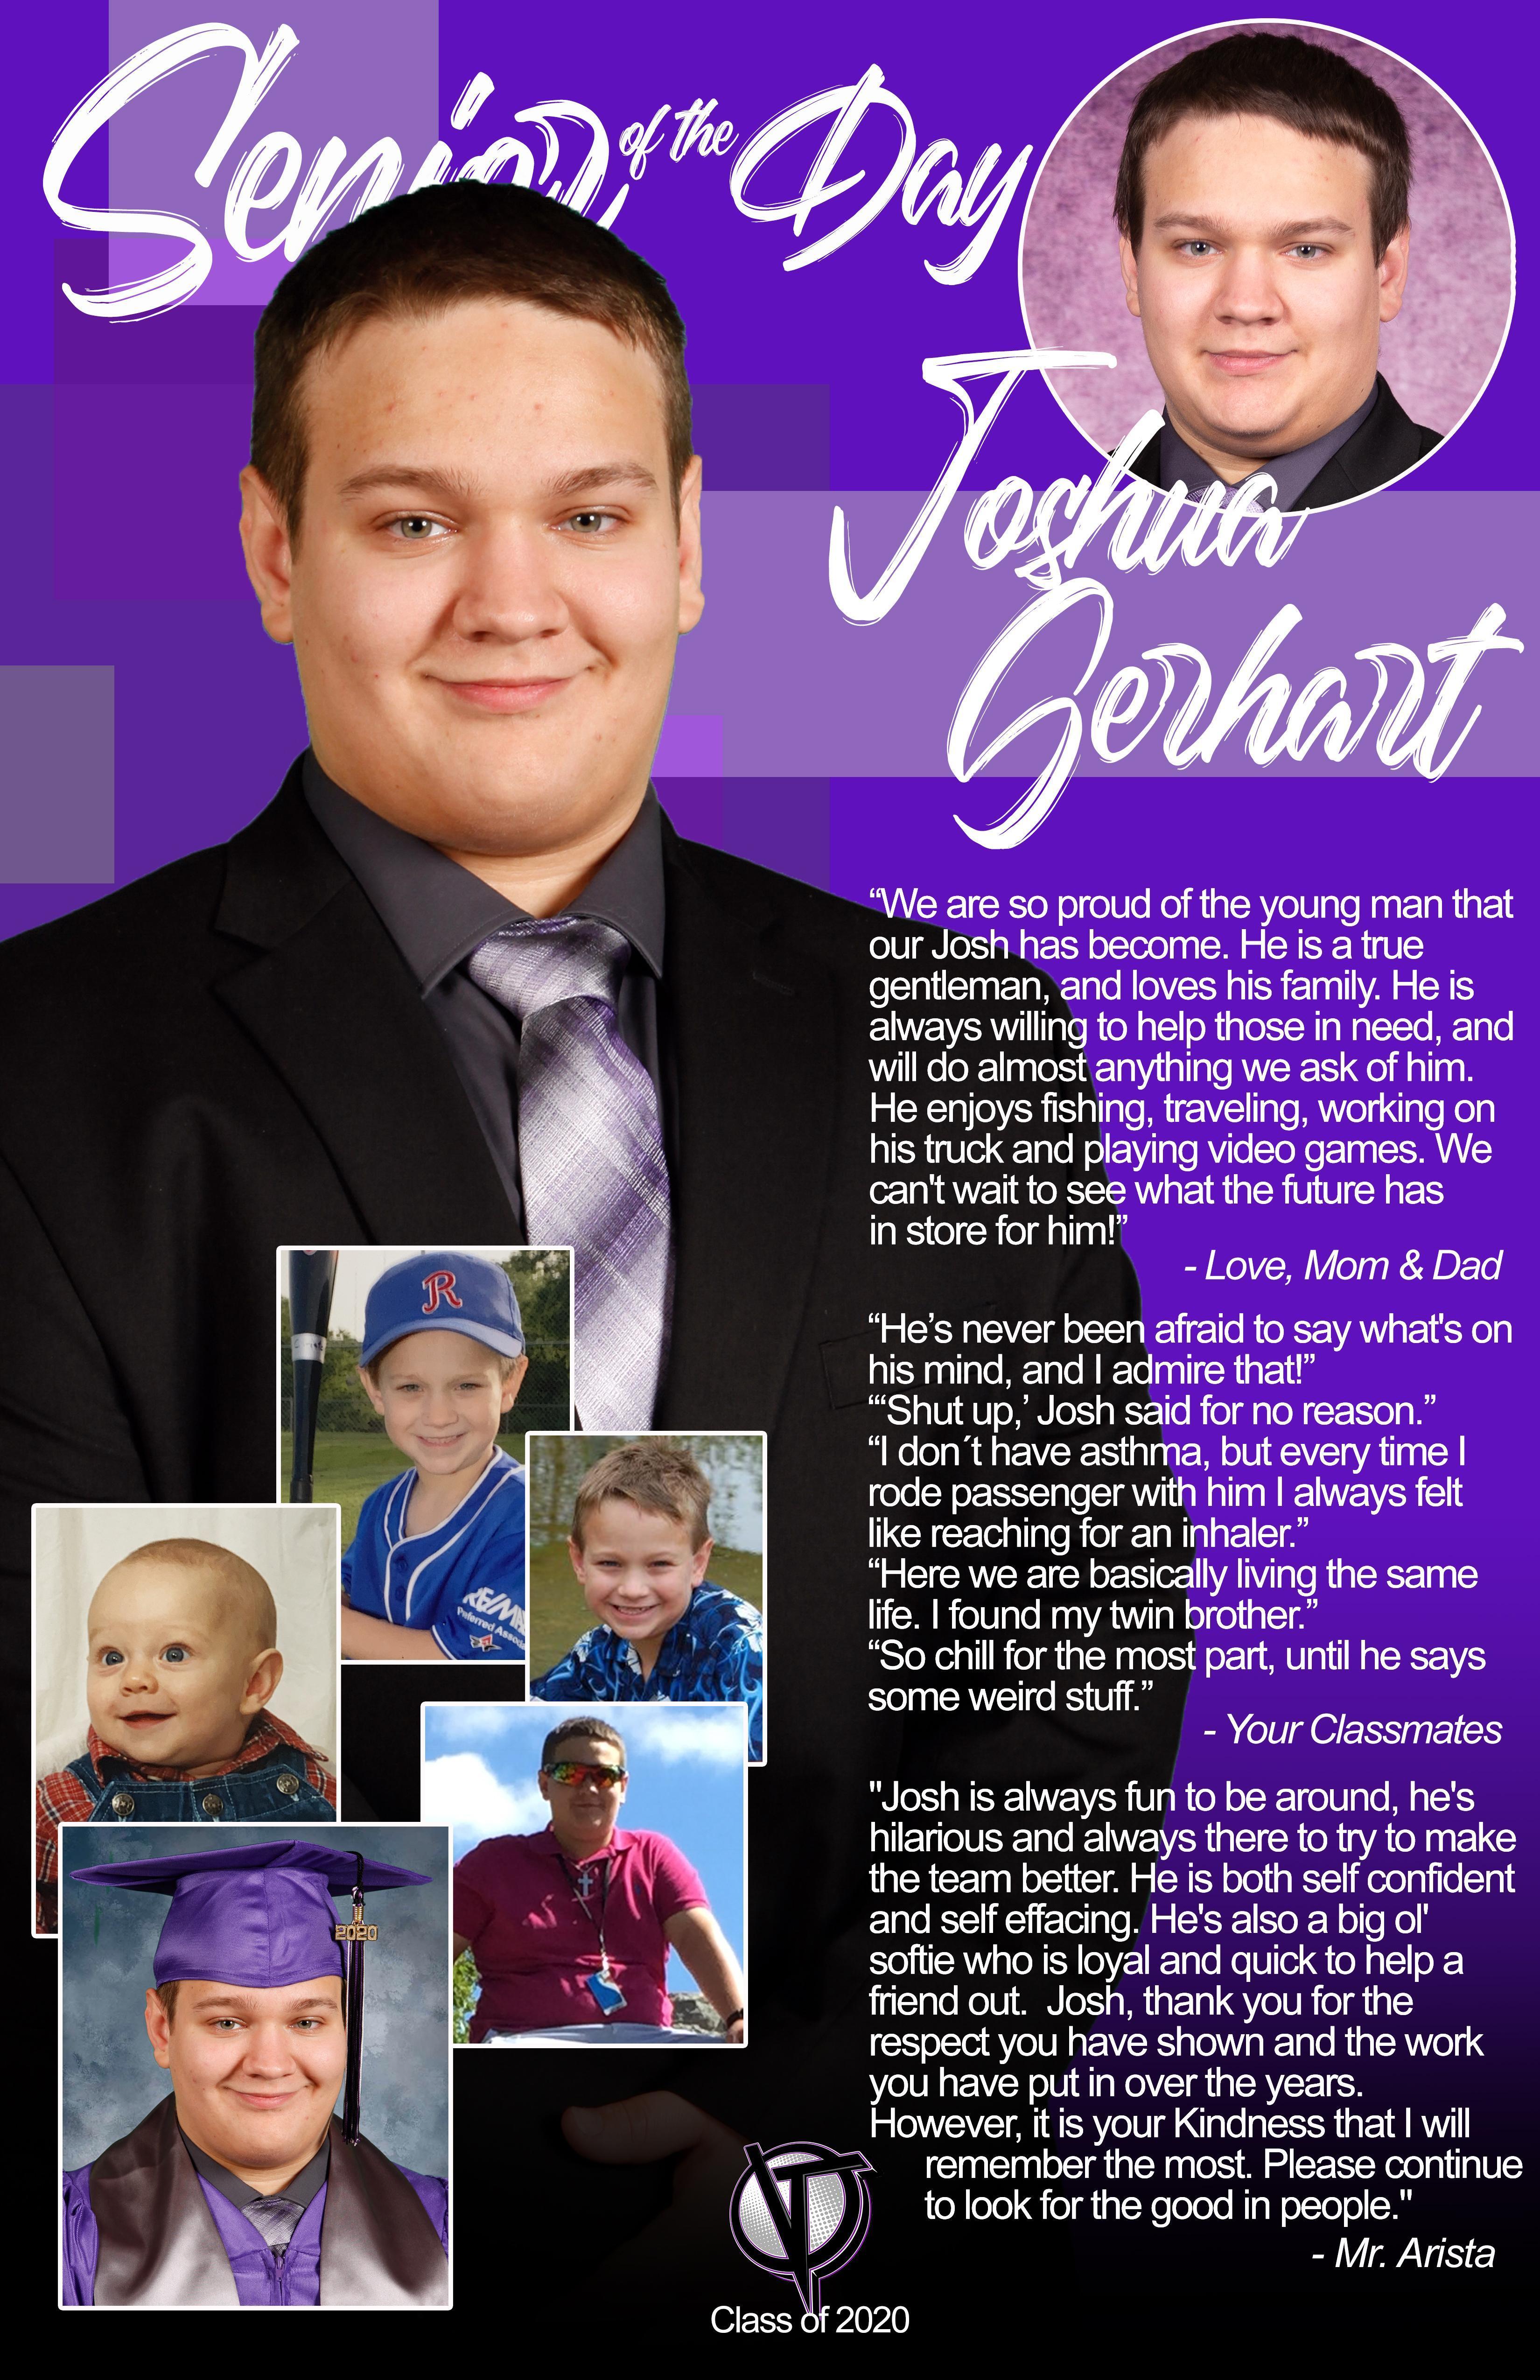 Josh Gerhart